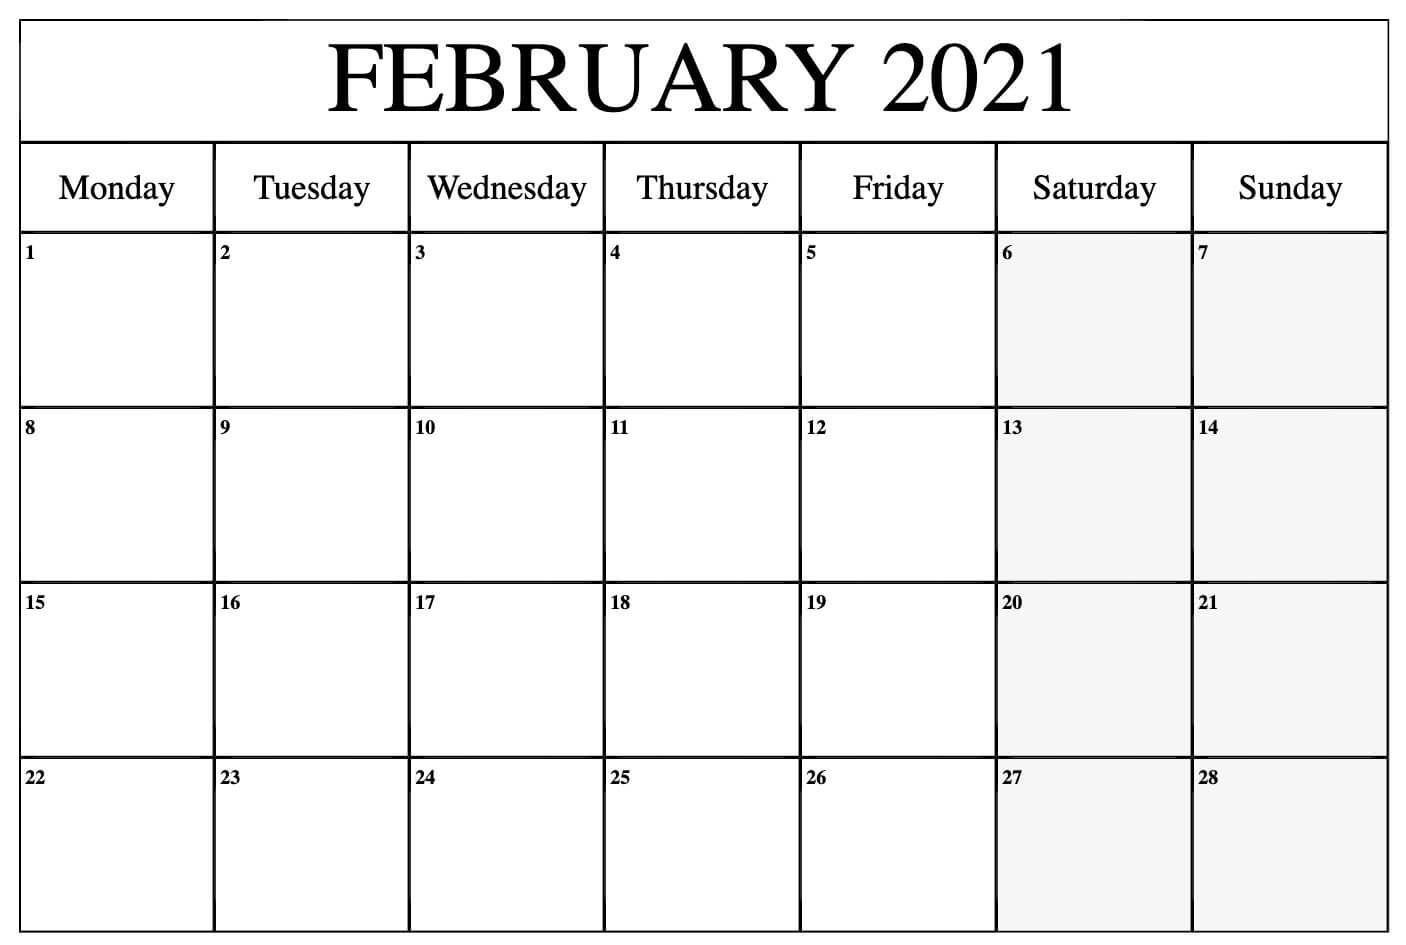 February 2021 Calendar In 2020 | Calendar Printables